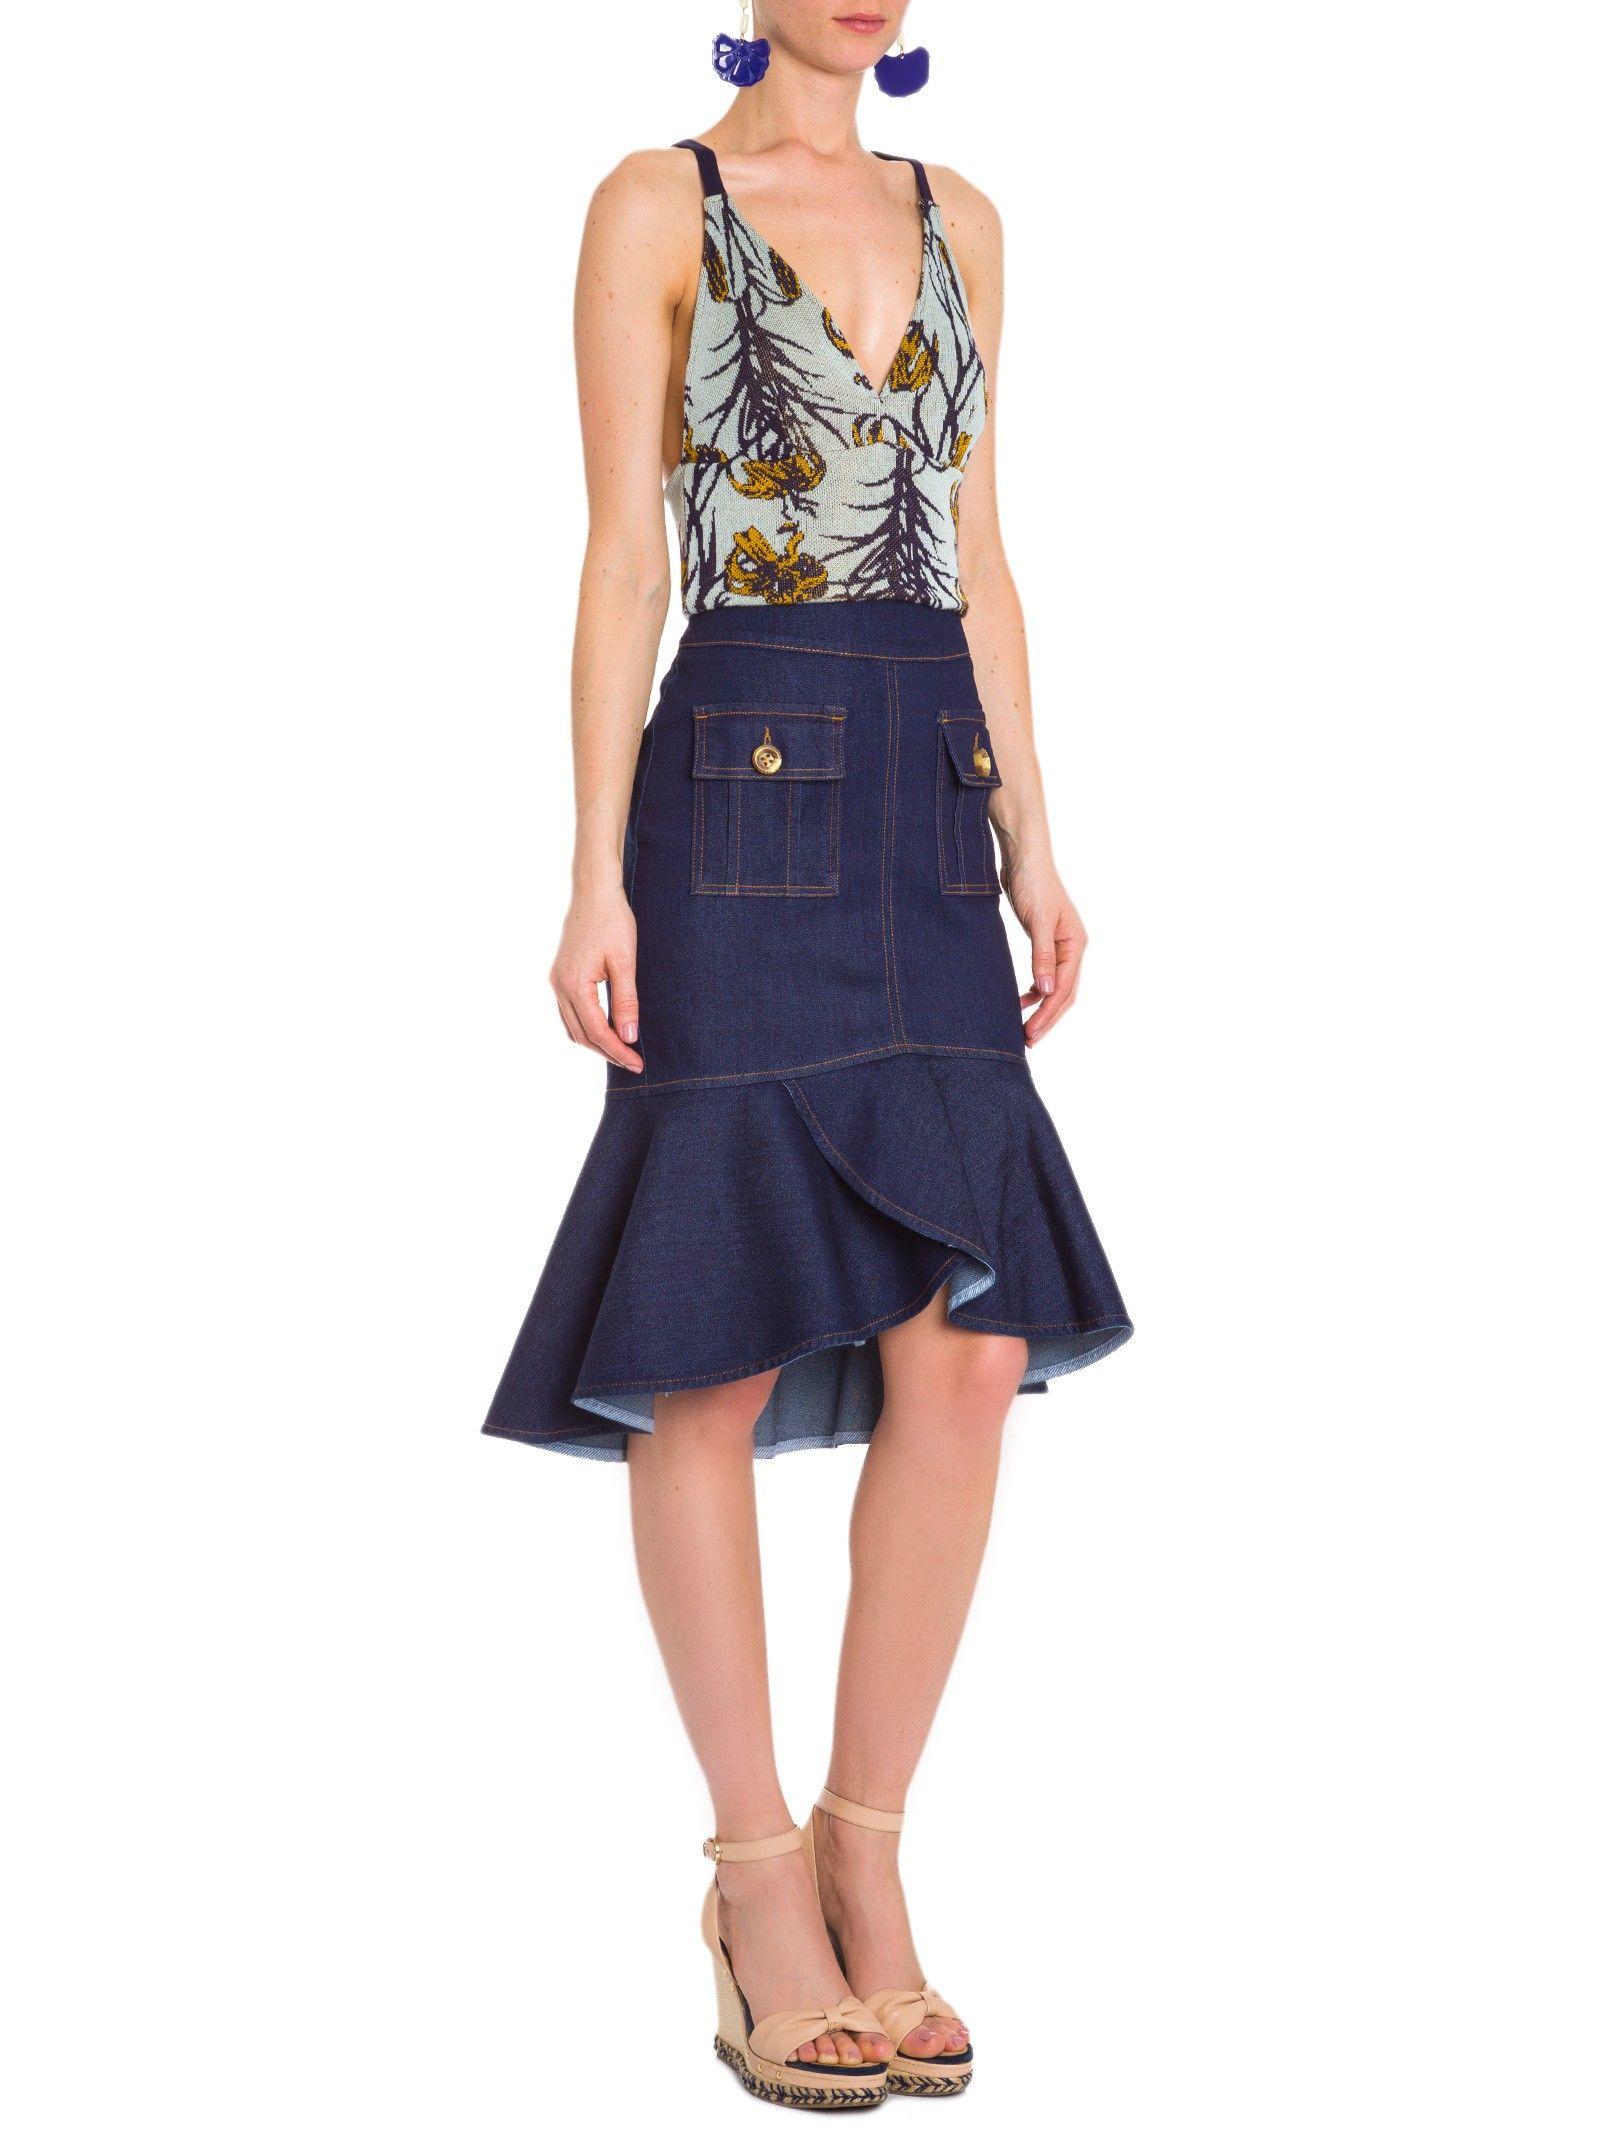 Top Jacquard Estampa Lily - Maria Filó - Azul - Shop2gether